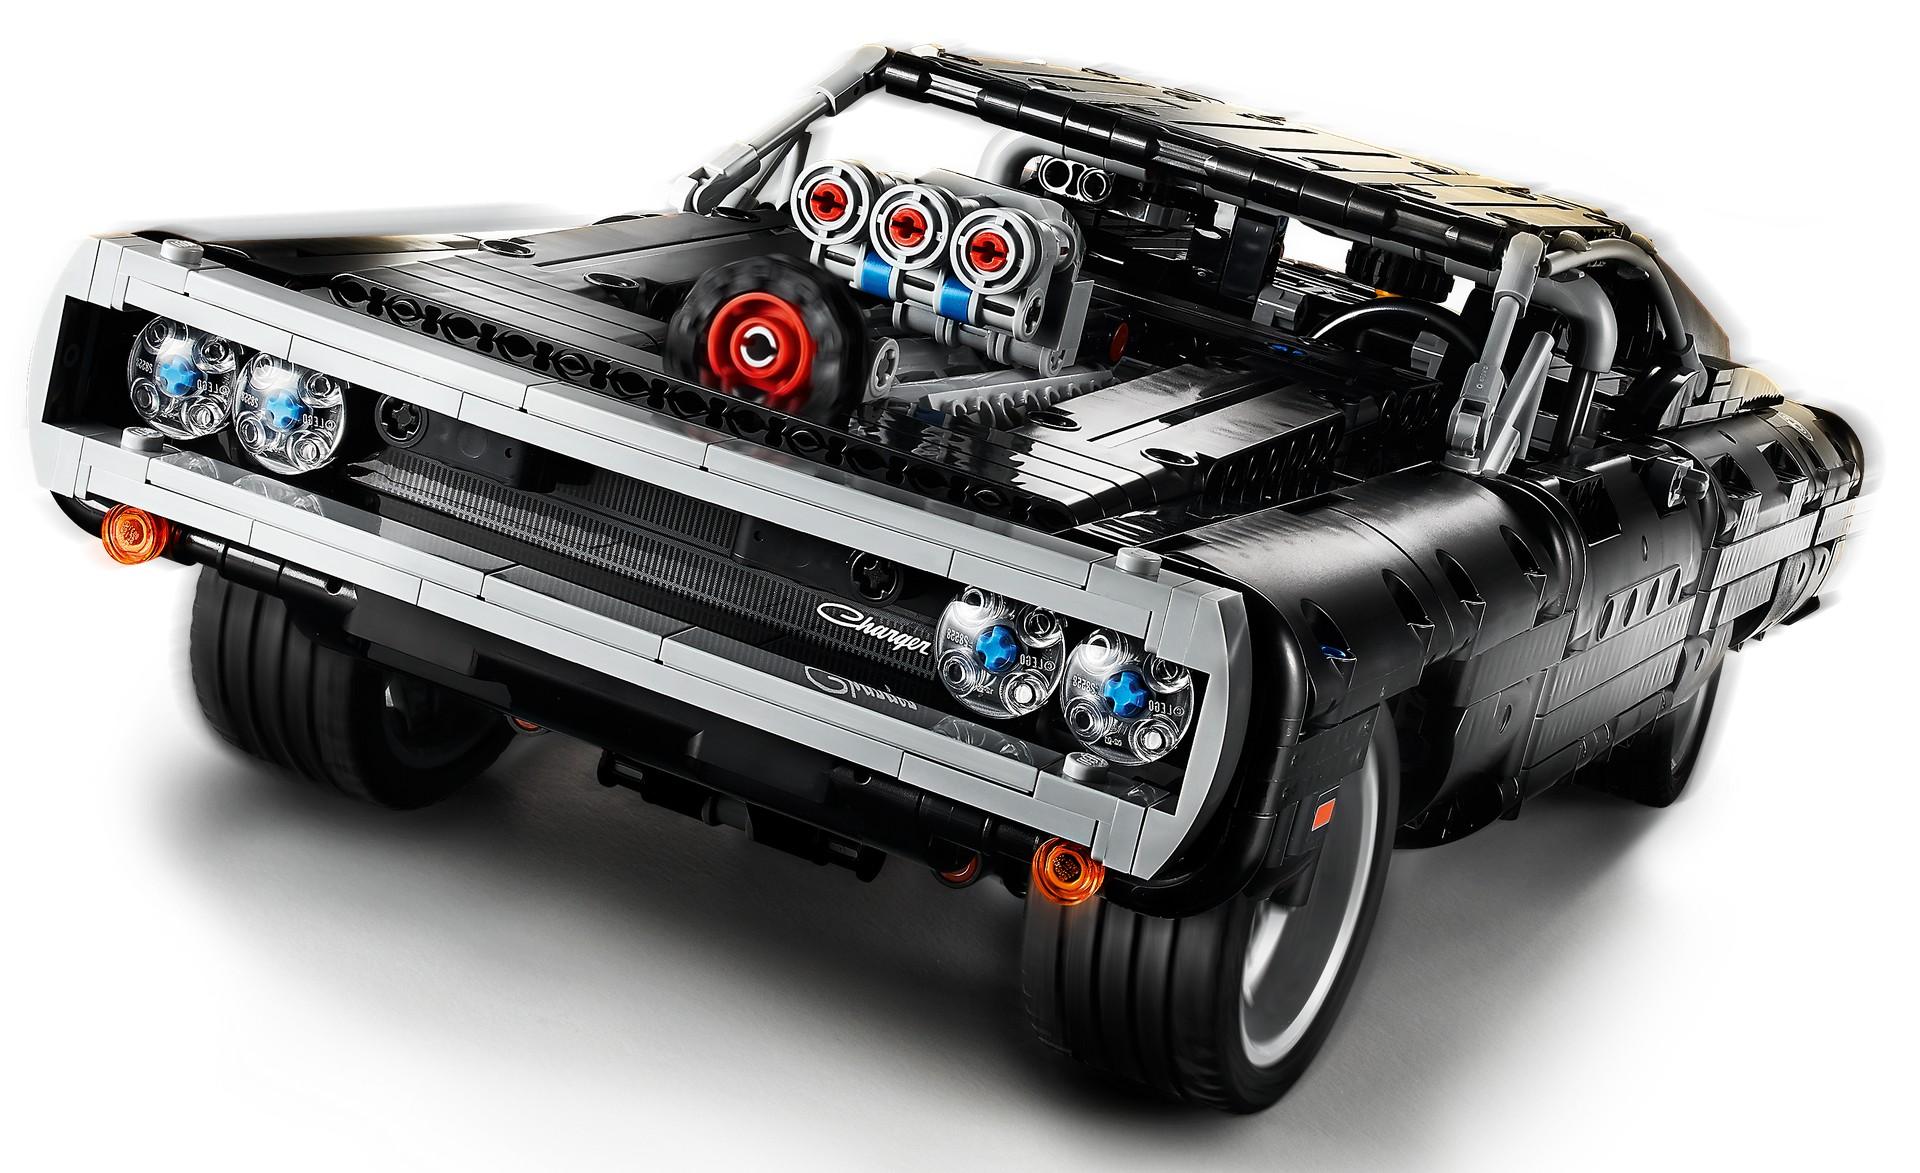 Dodge Charger de Fast and Furious em Lego